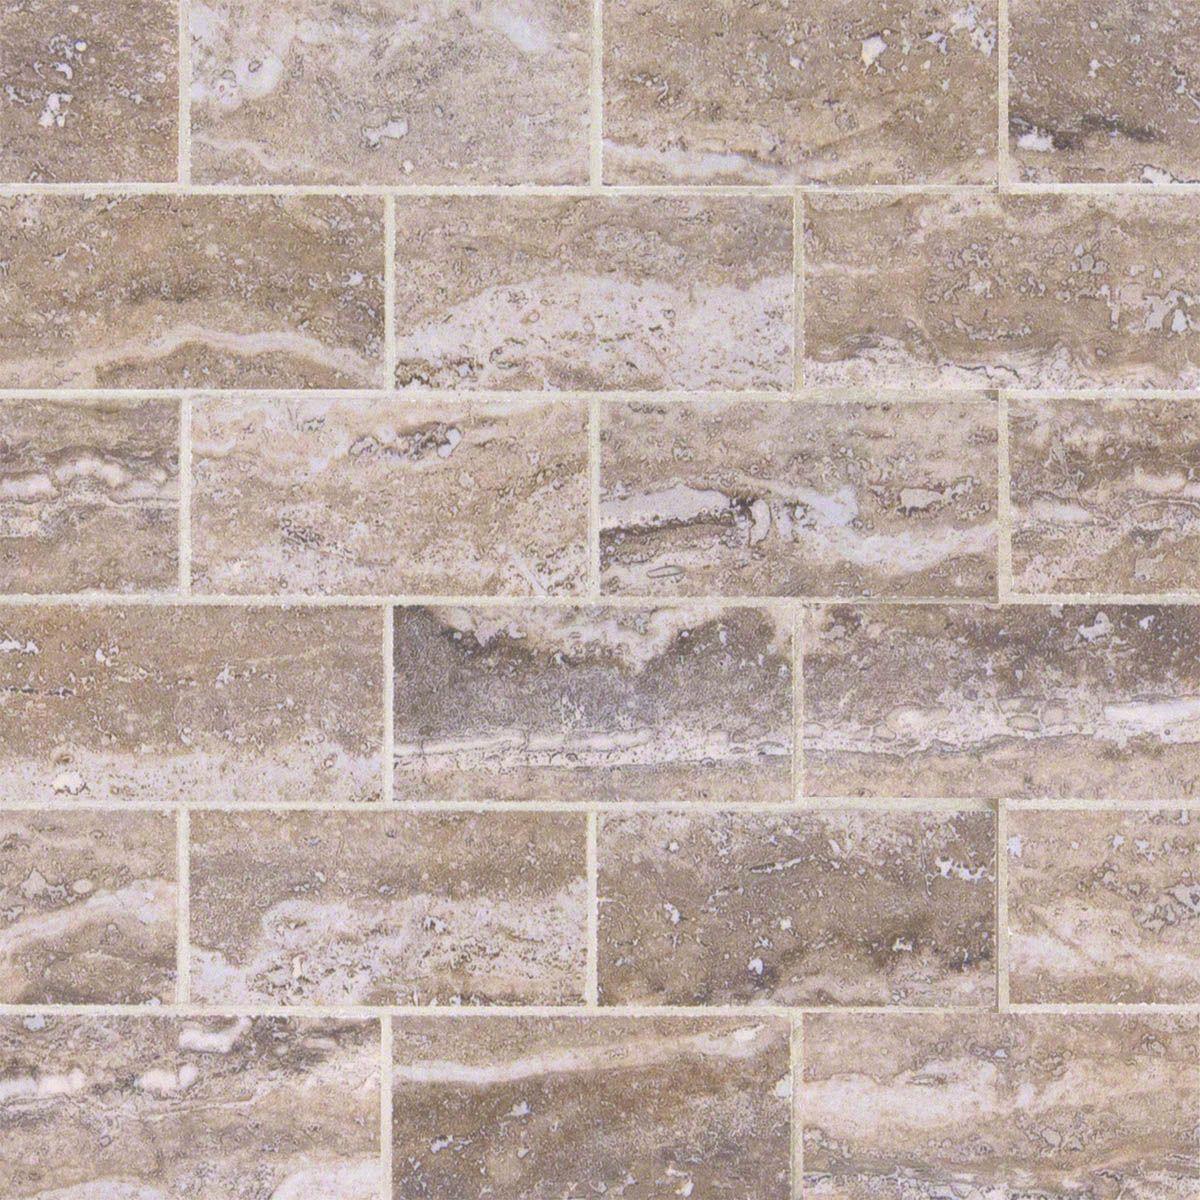 Pietra venata gray subway tile 2x4 backsplash ideas pinterest pietra venata gray subway tile 2x4 dailygadgetfo Gallery